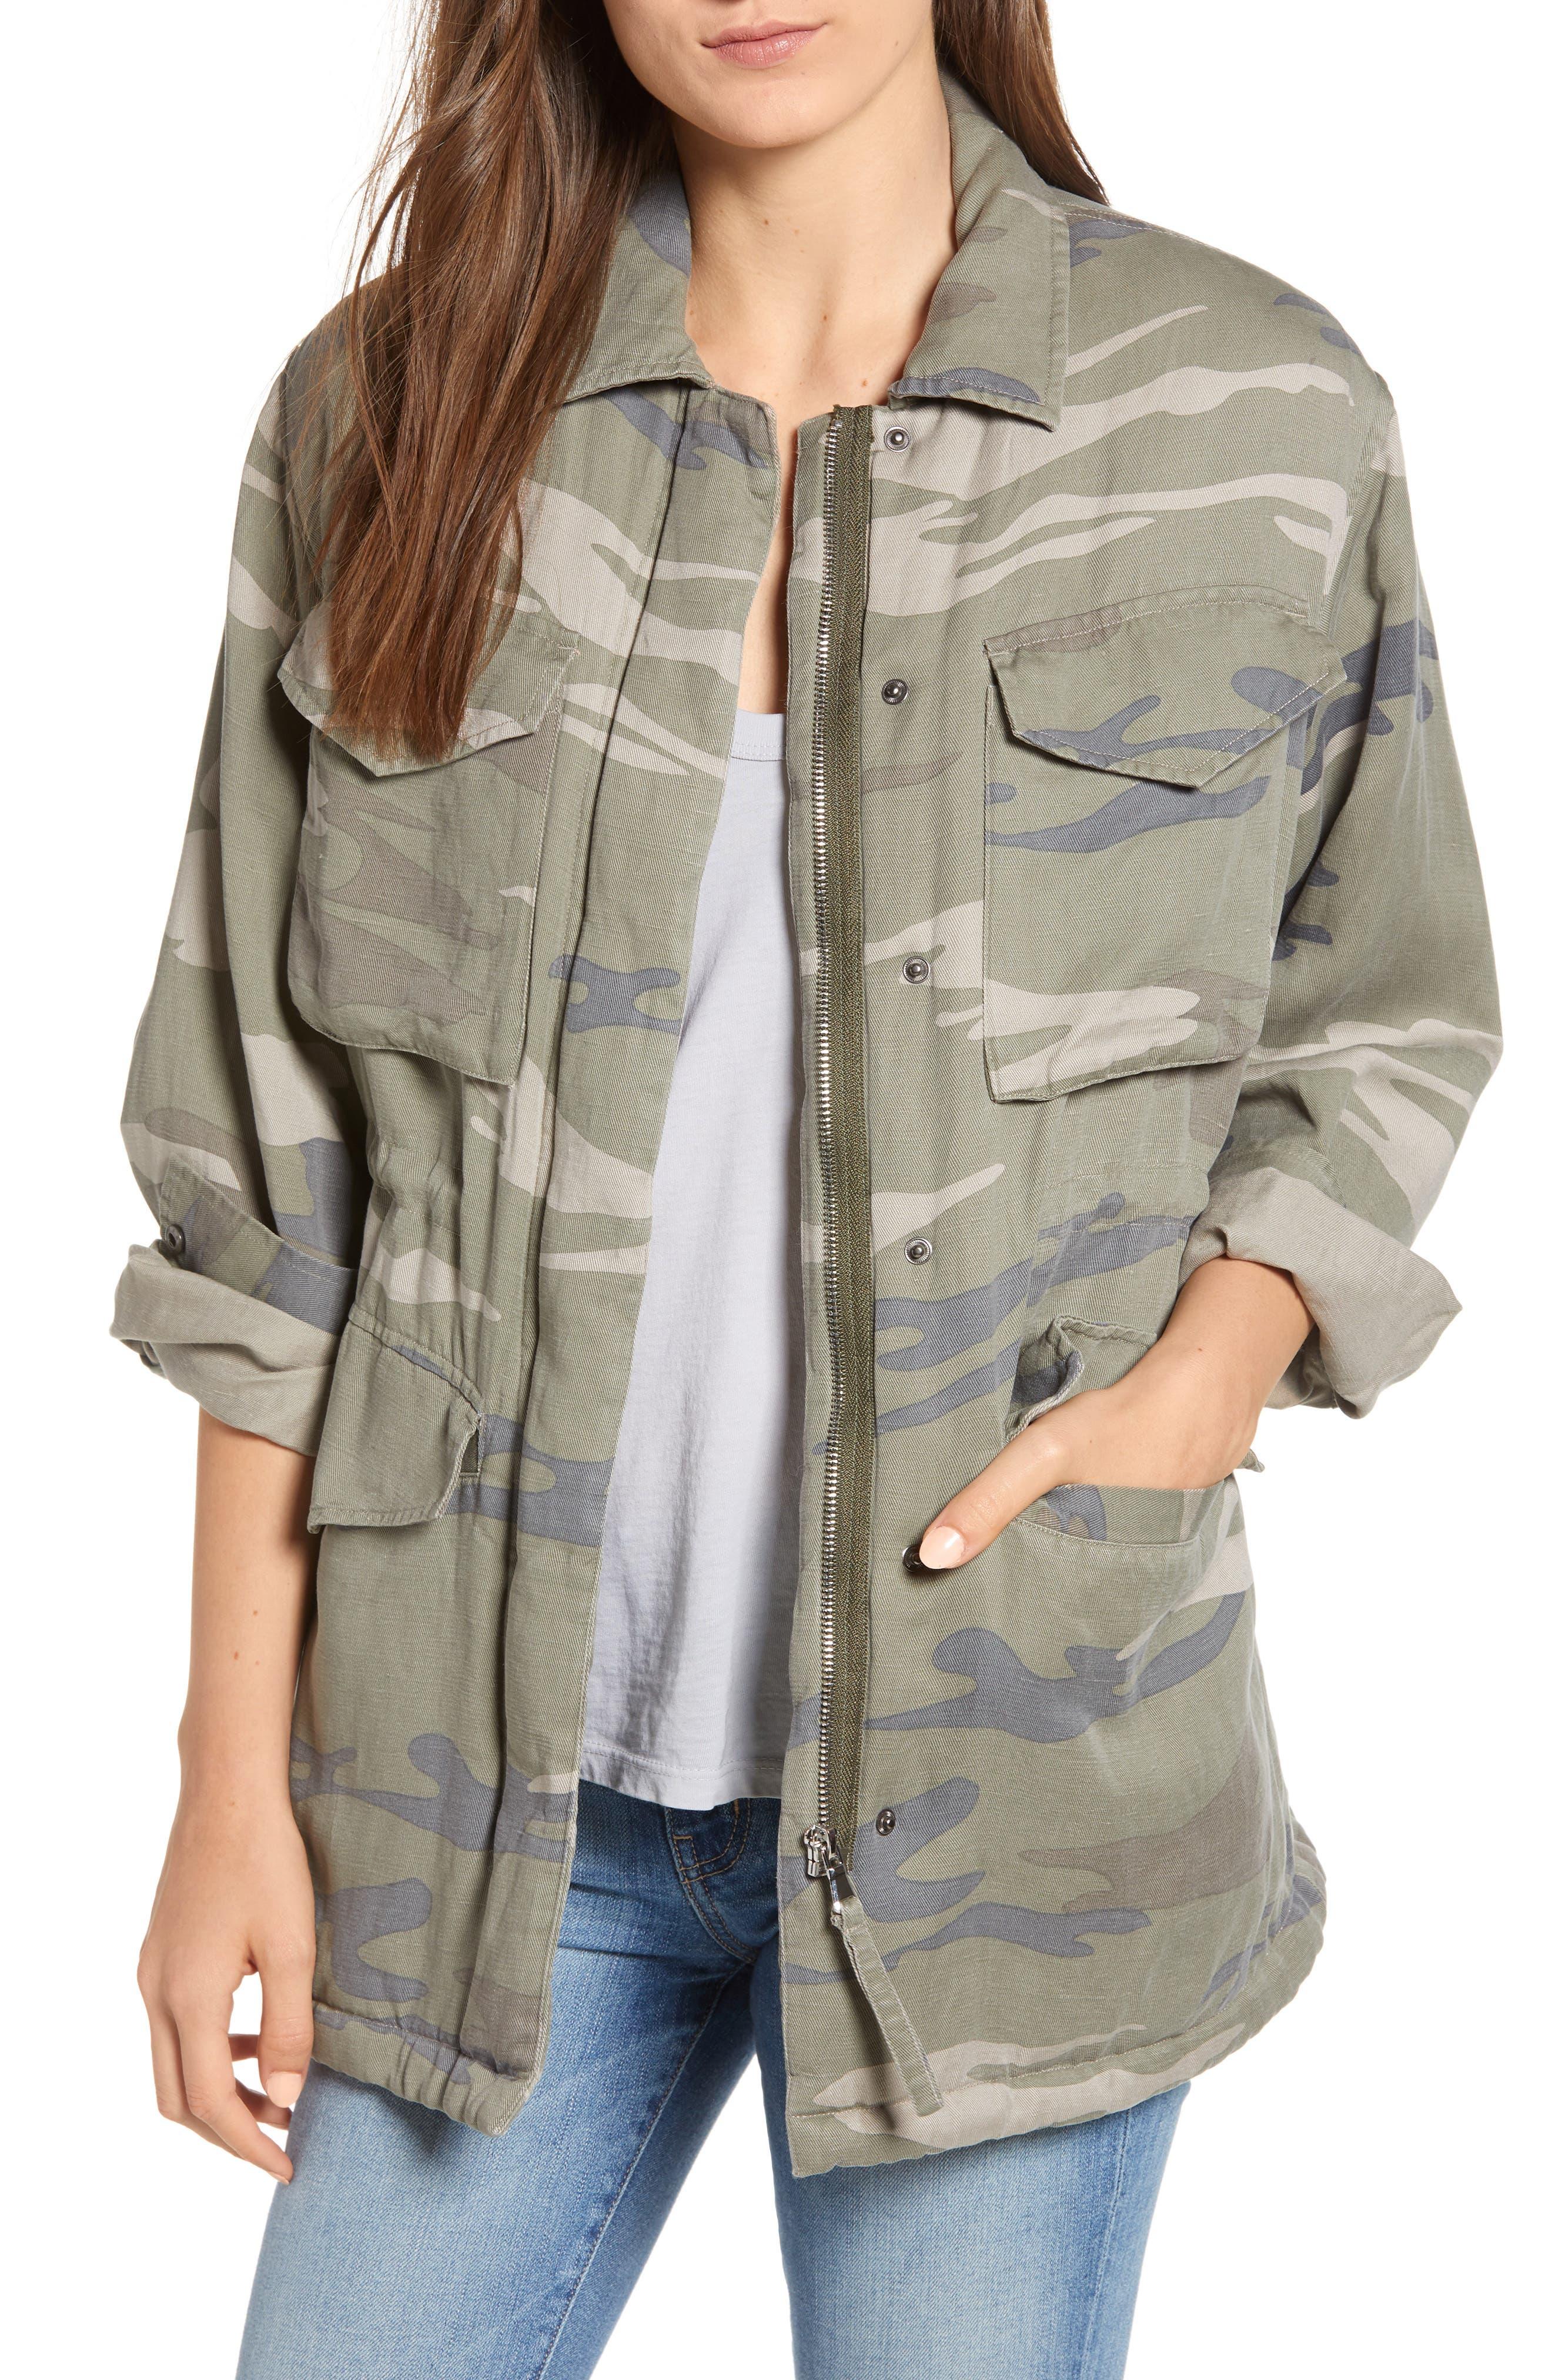 Whitaker Camo Utility Linen Blend Jacket,                         Main,                         color, SAGE CAMO